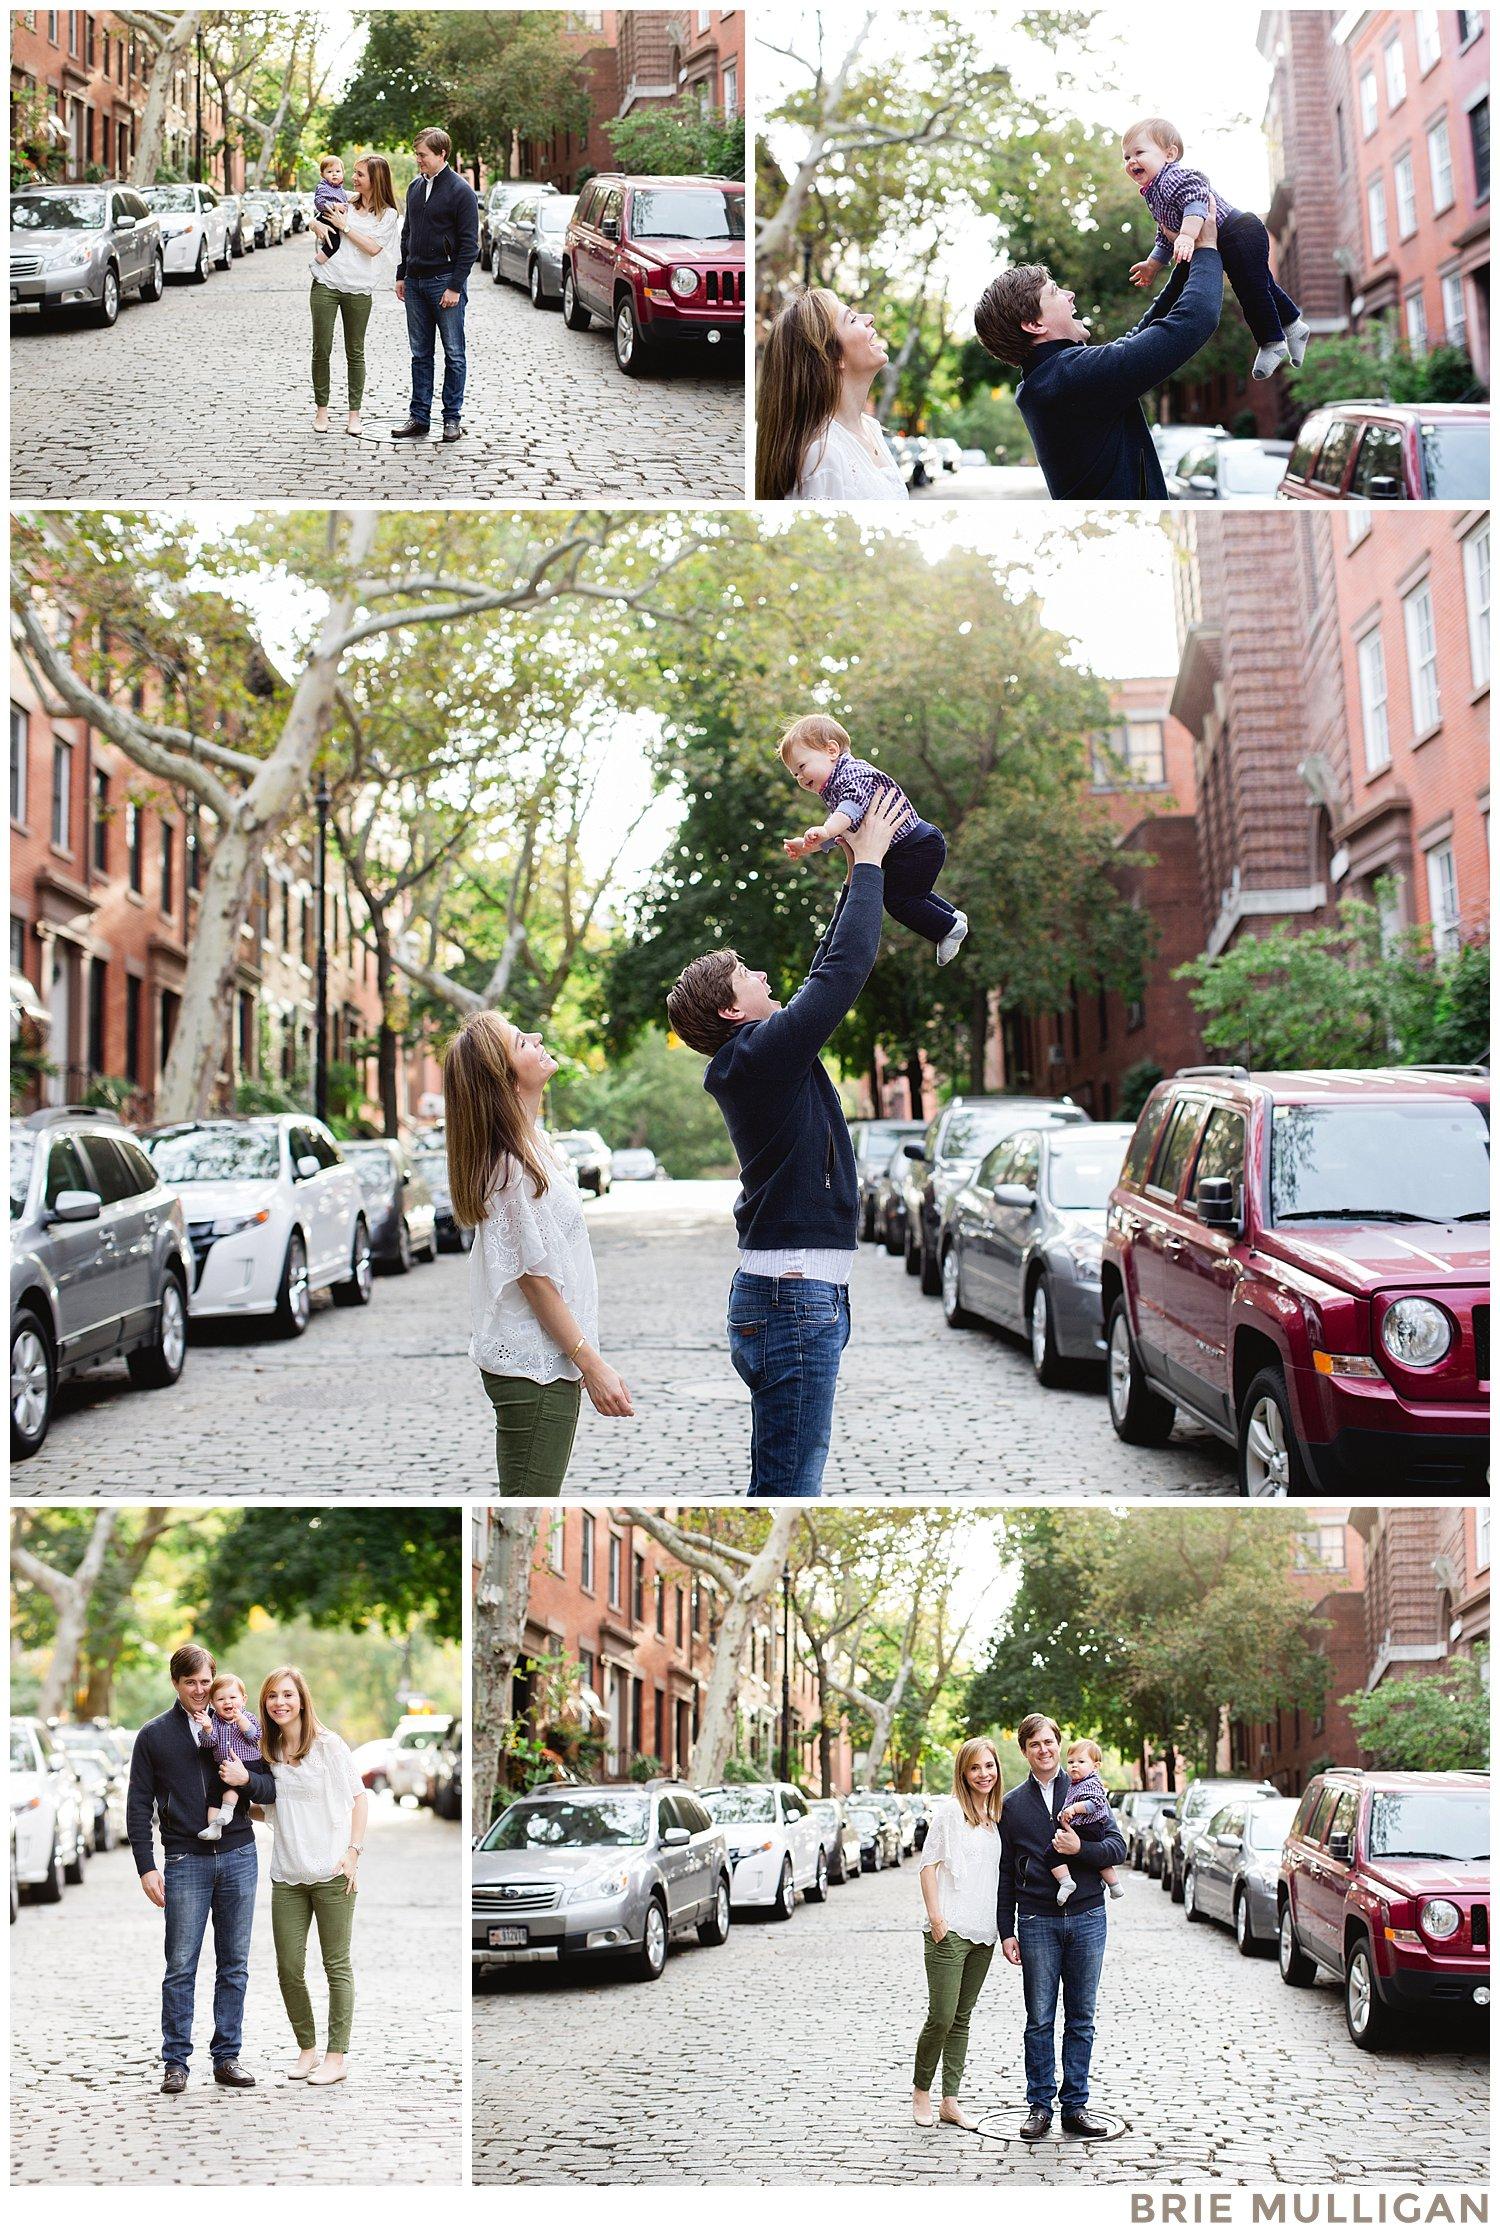 Brie-Mulligan-Family-and-Newborn-Photographer-NYC-and-Northern-NJ_0128.jpg